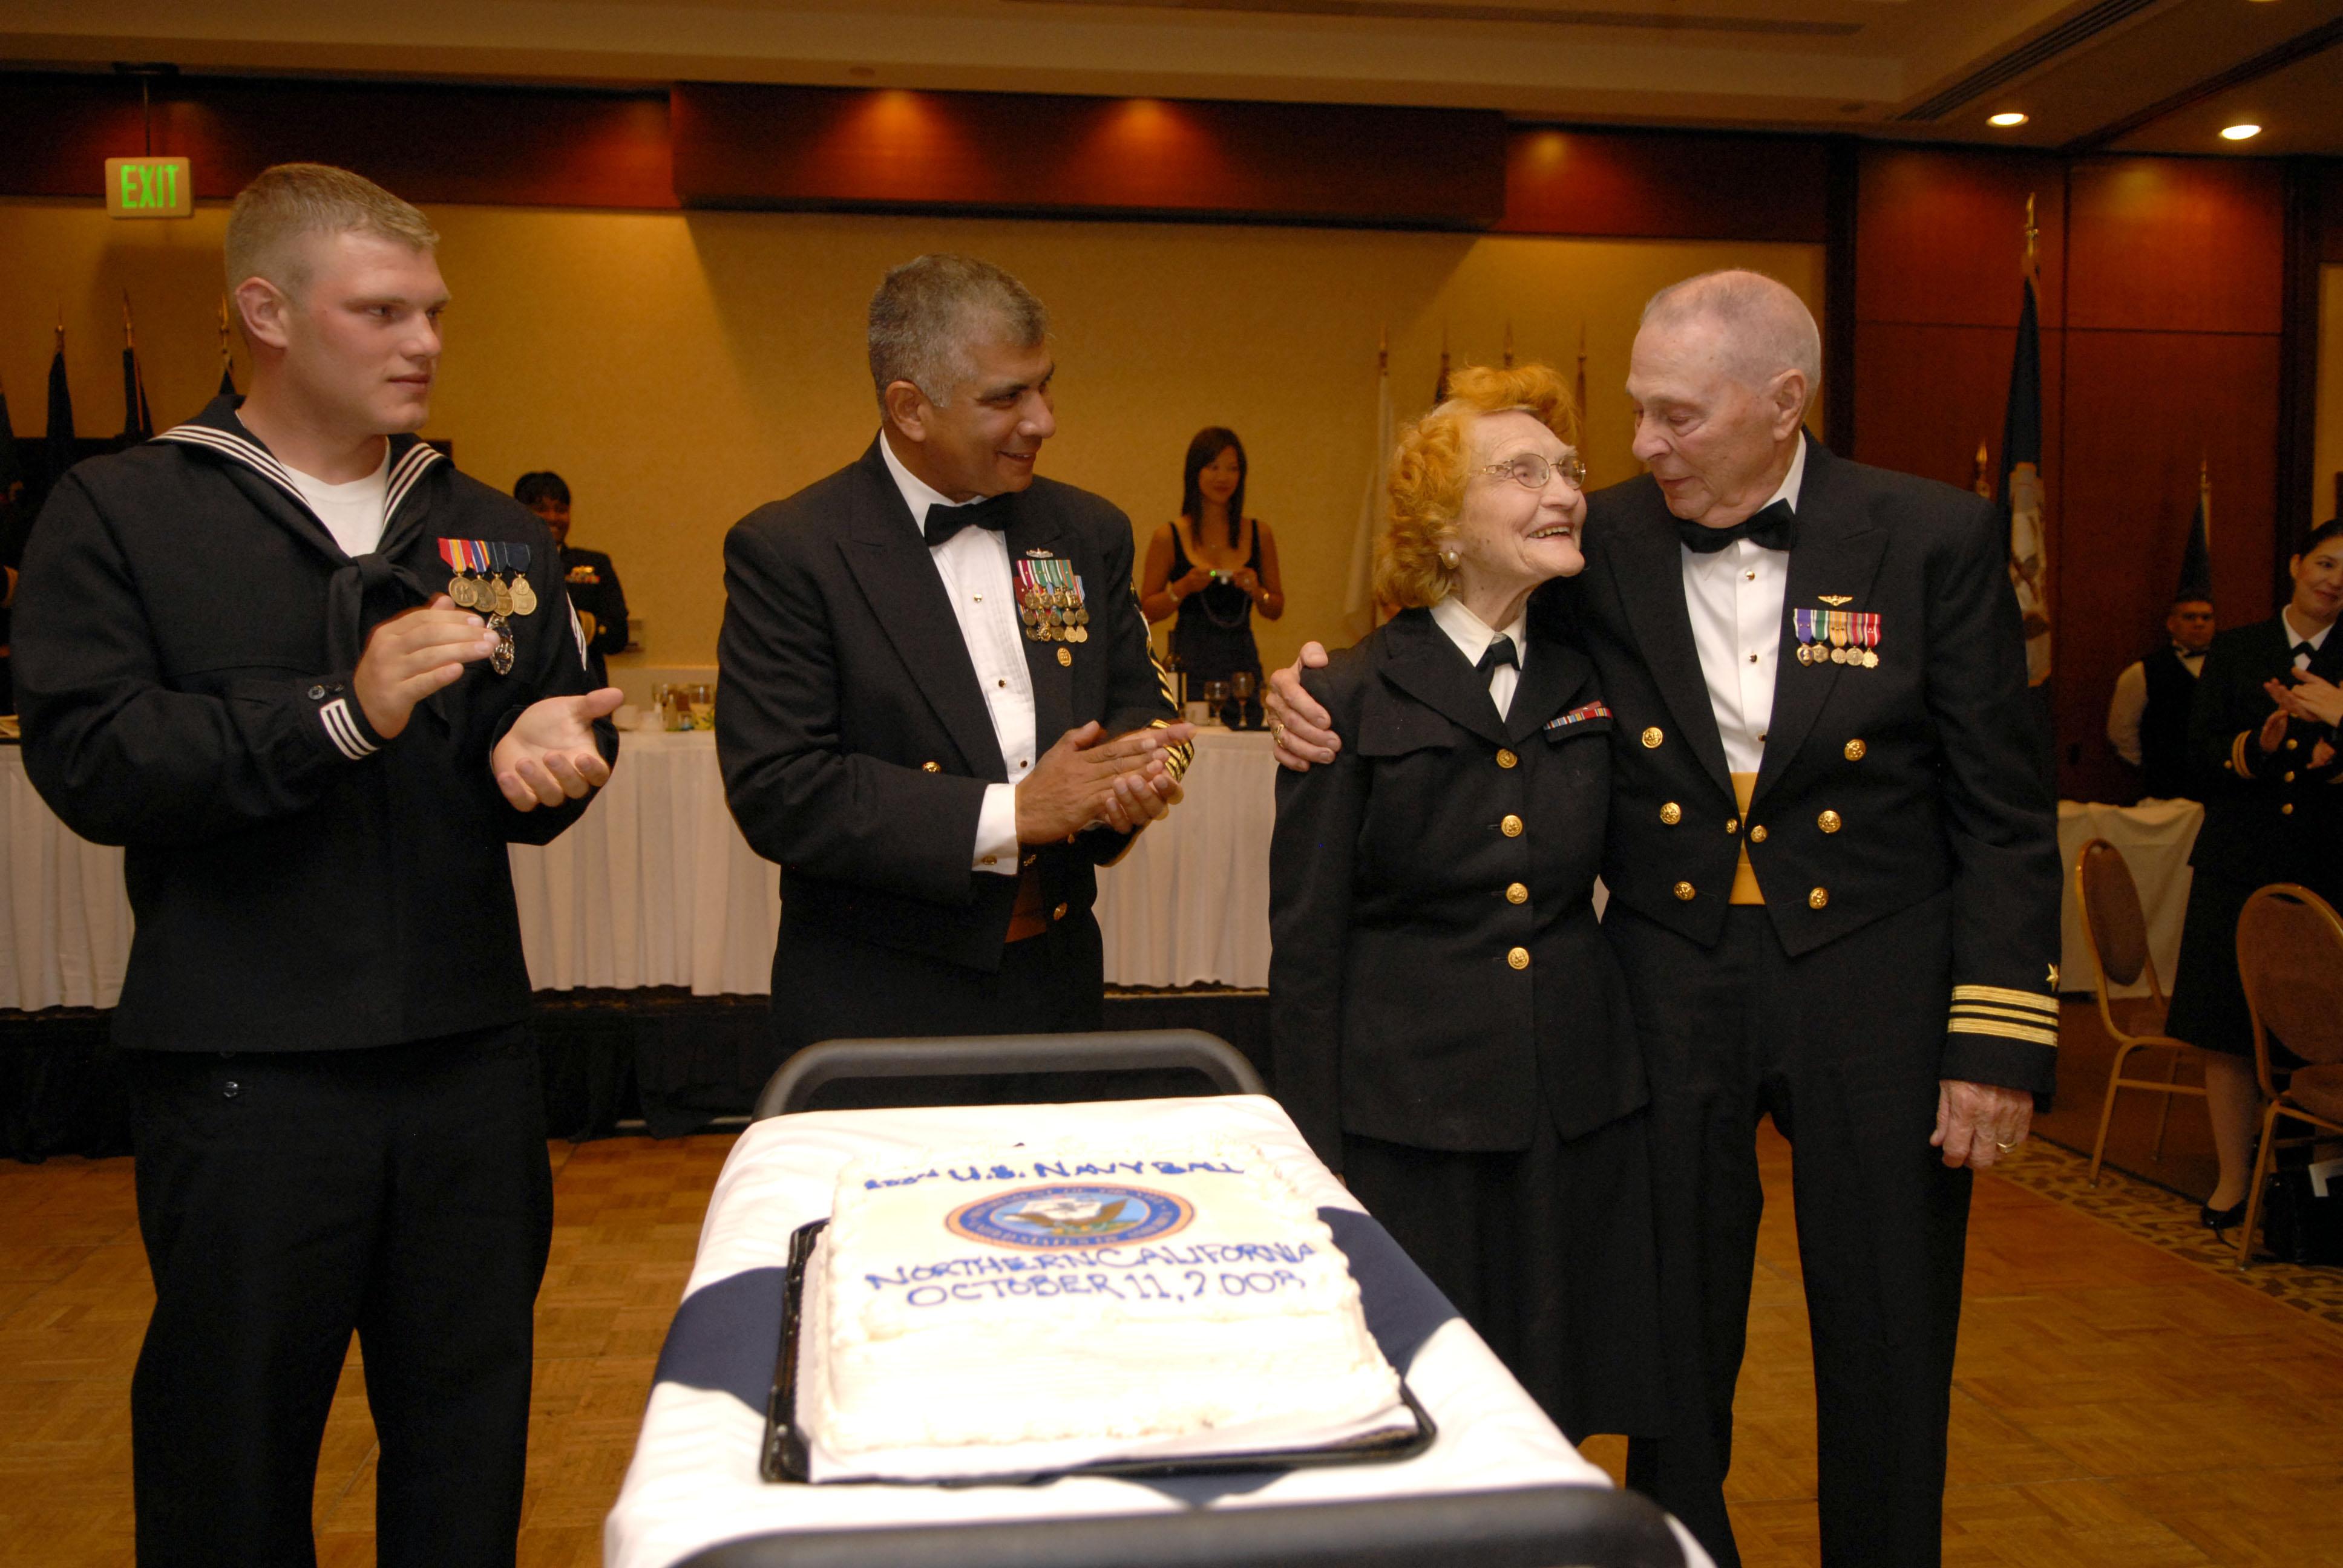 File:US Navy 081011-N-9818V-082 Master-At-Arms Seaman Jerry Ogg